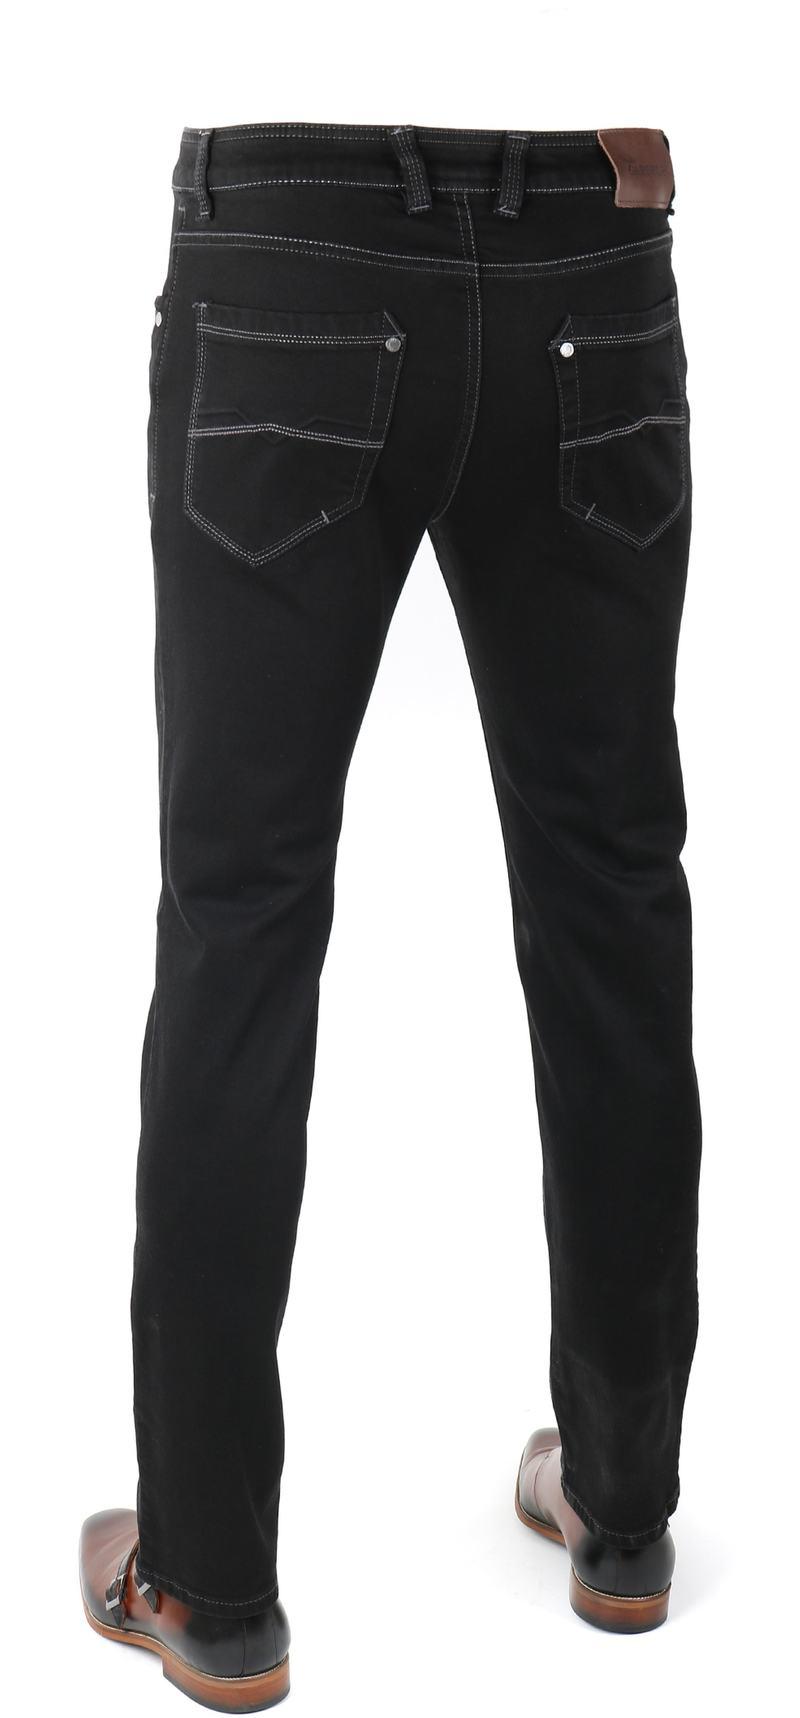 Gardeur Batu Pants Black photo 1